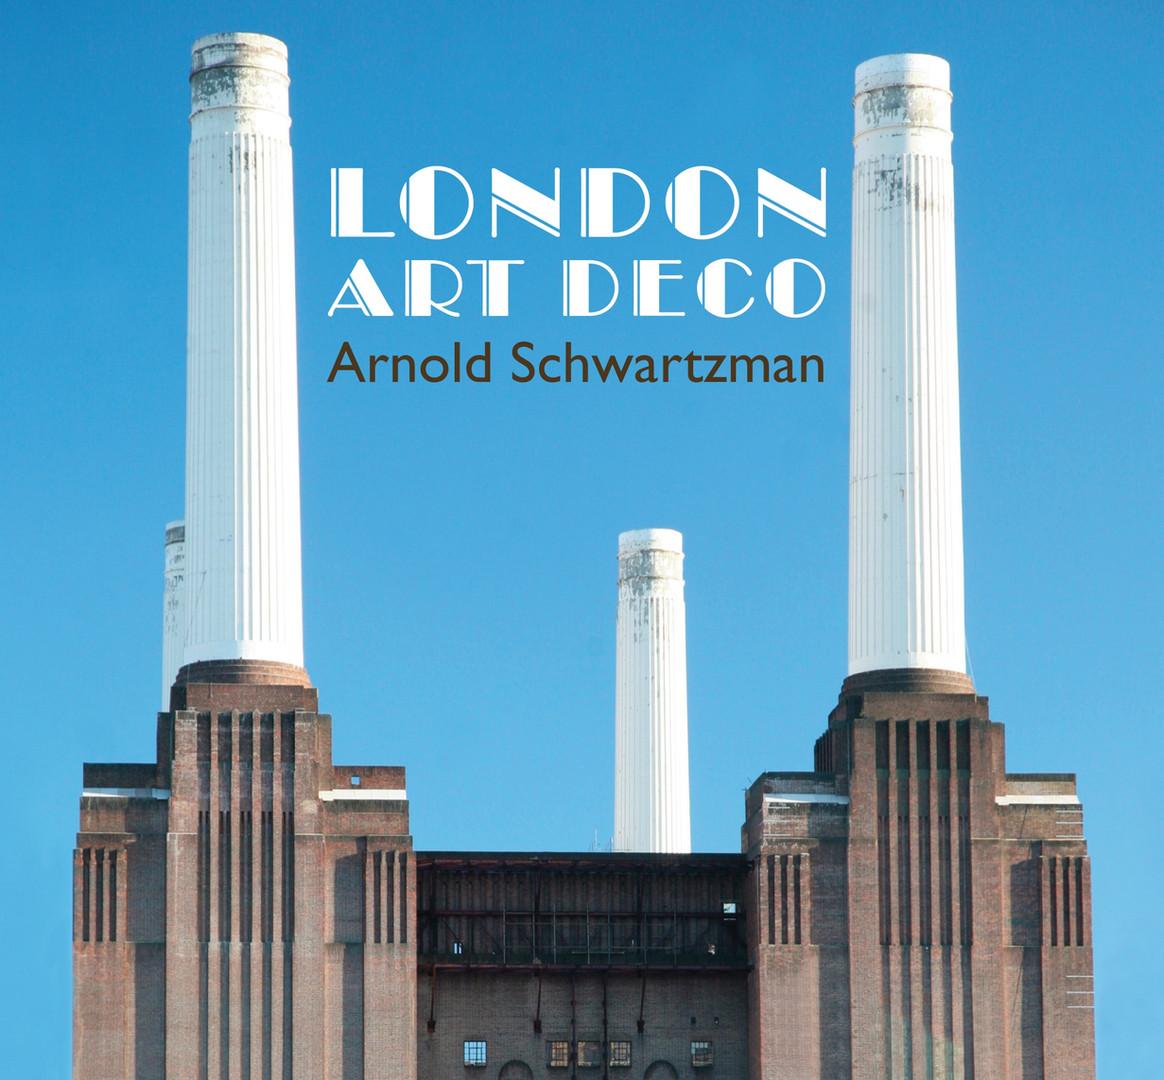 London Art Deco